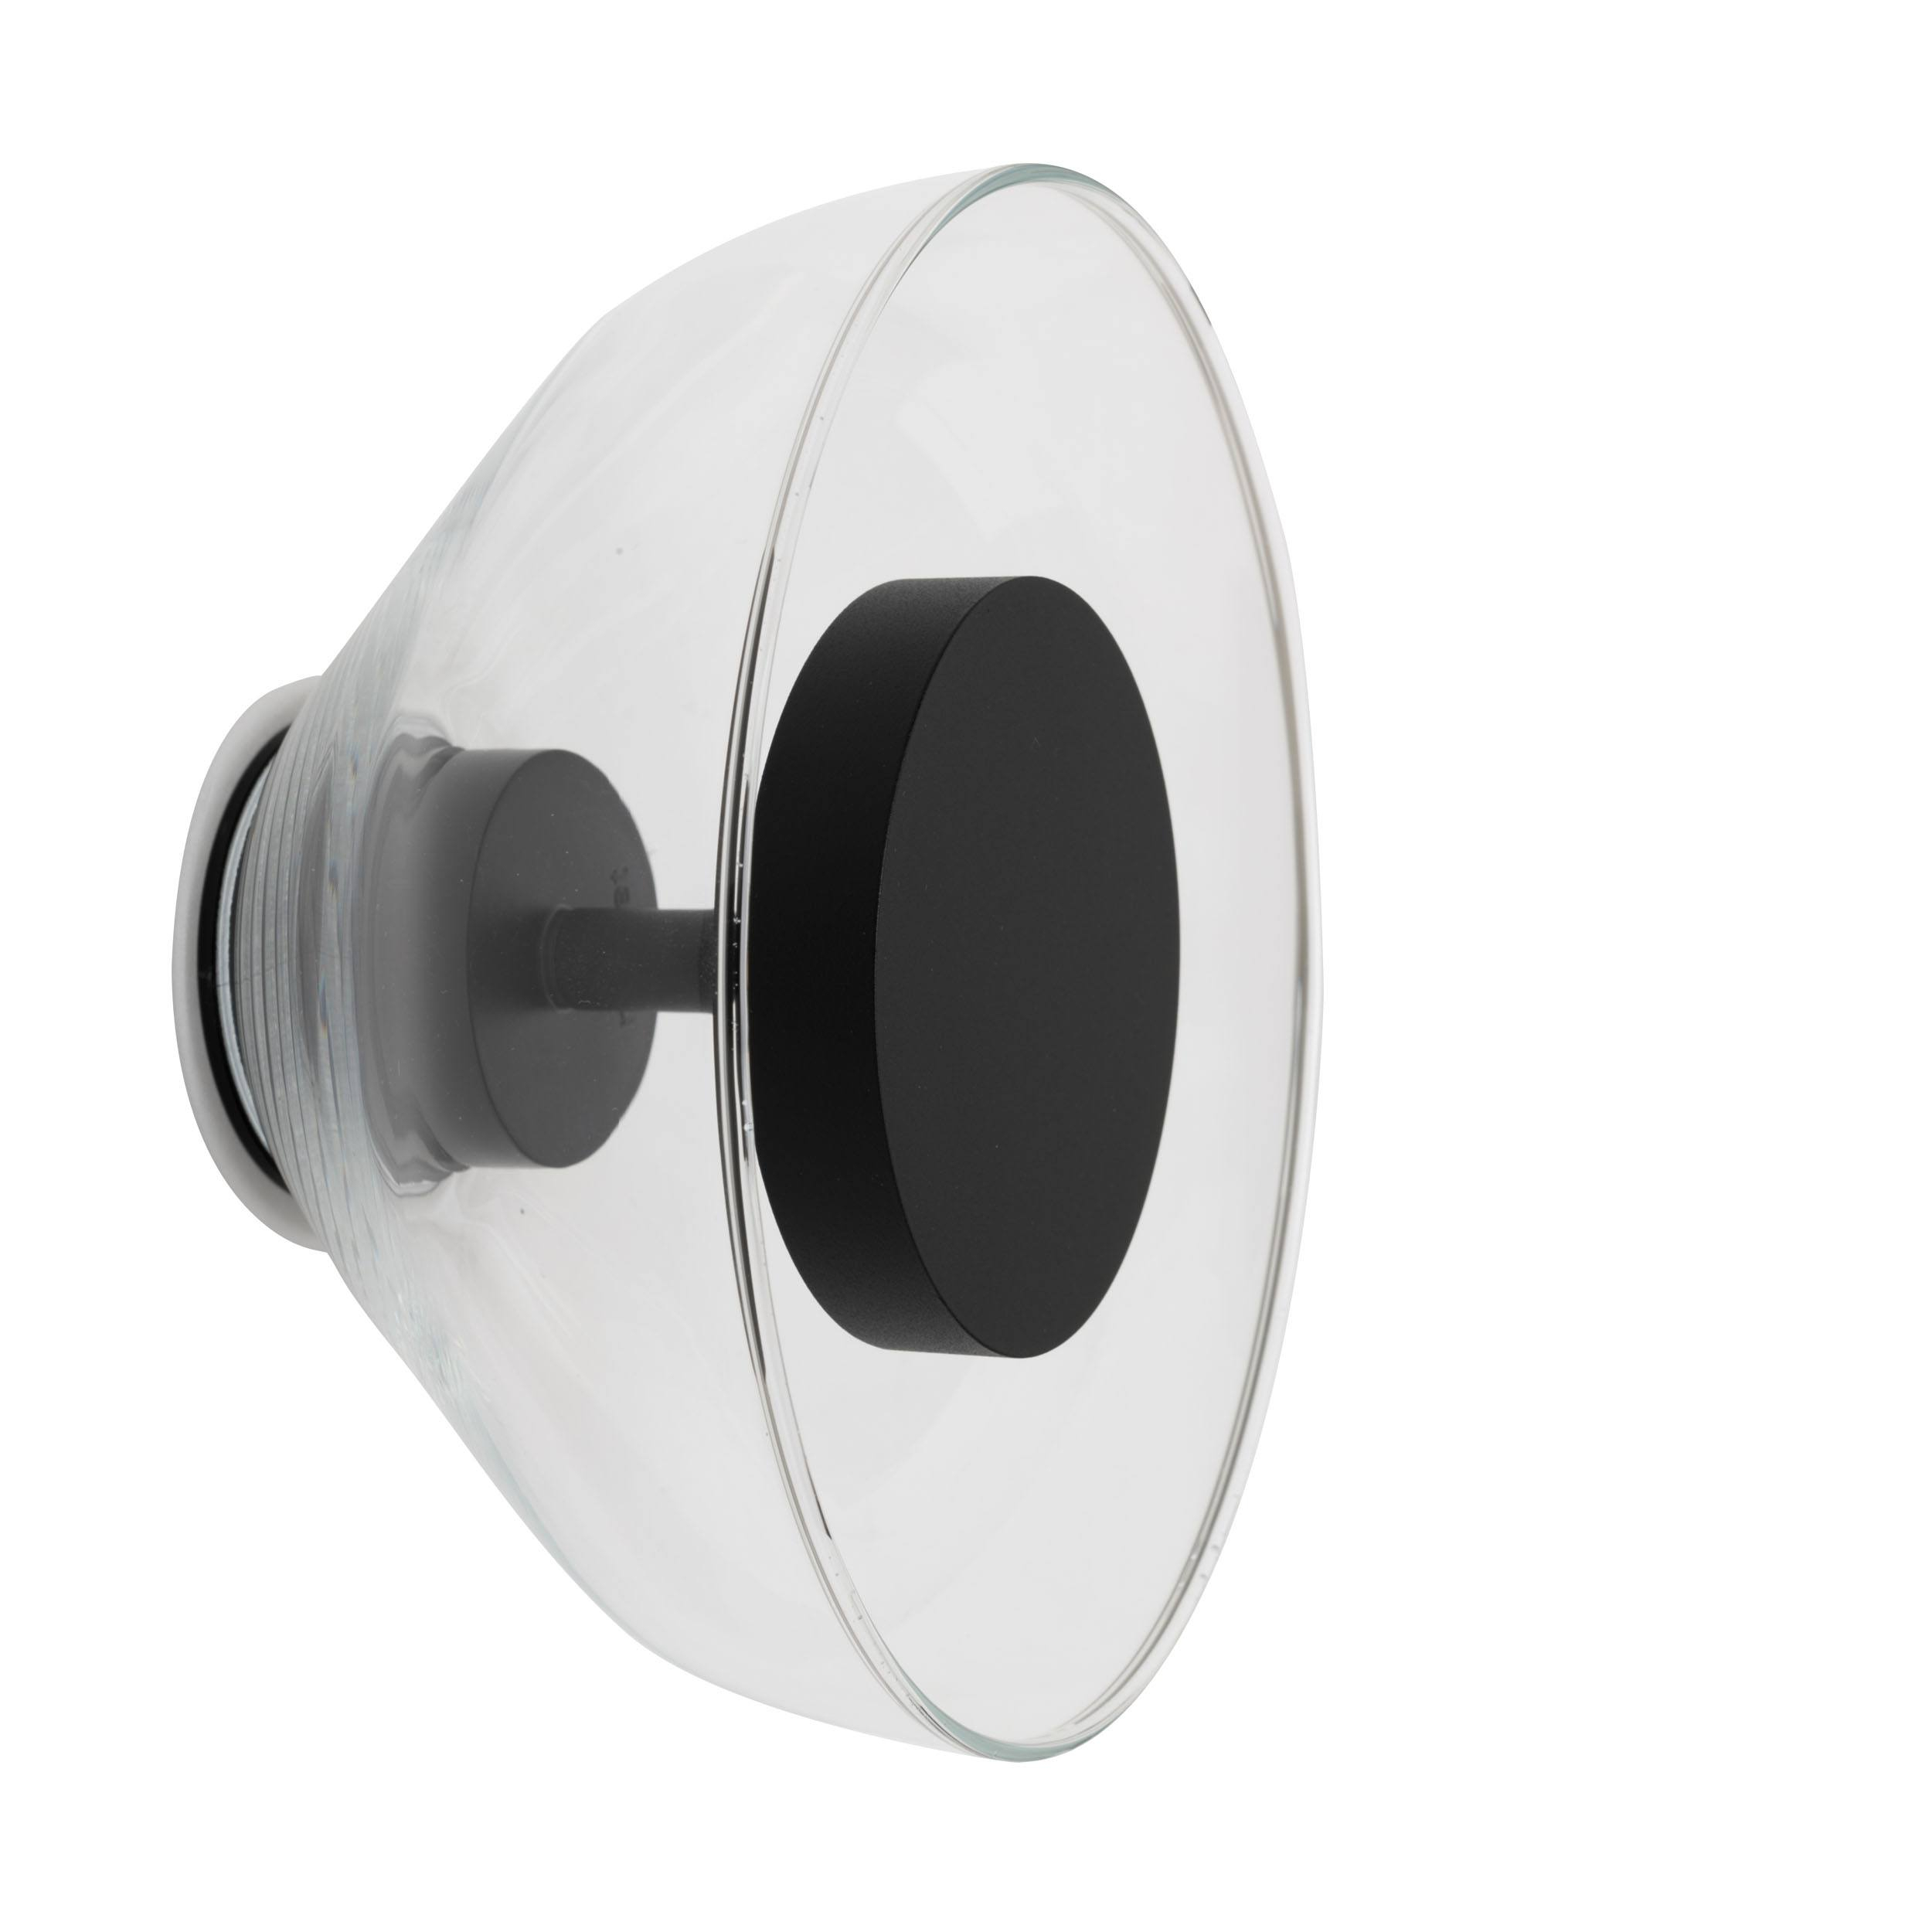 Aura LED Wandleuchte